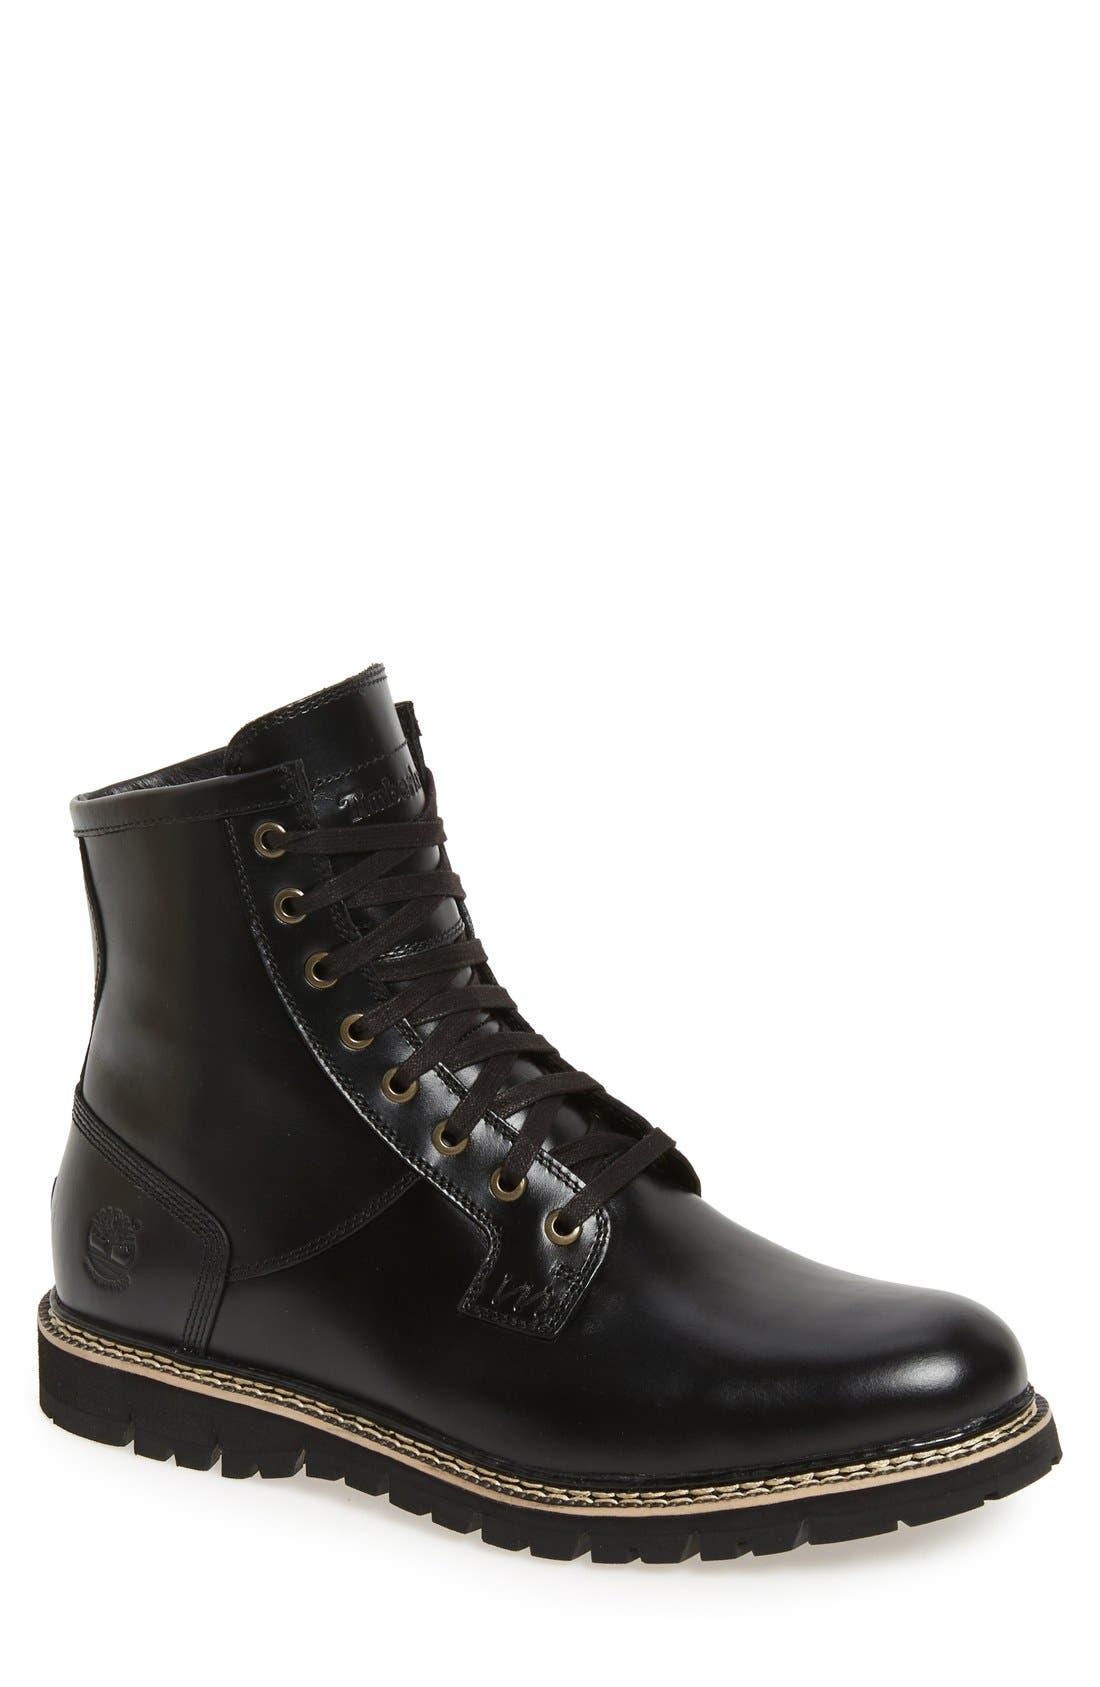 Alternate Image 1 Selected - Timberland 'BrittonHill' Waterproof Boot (Men)